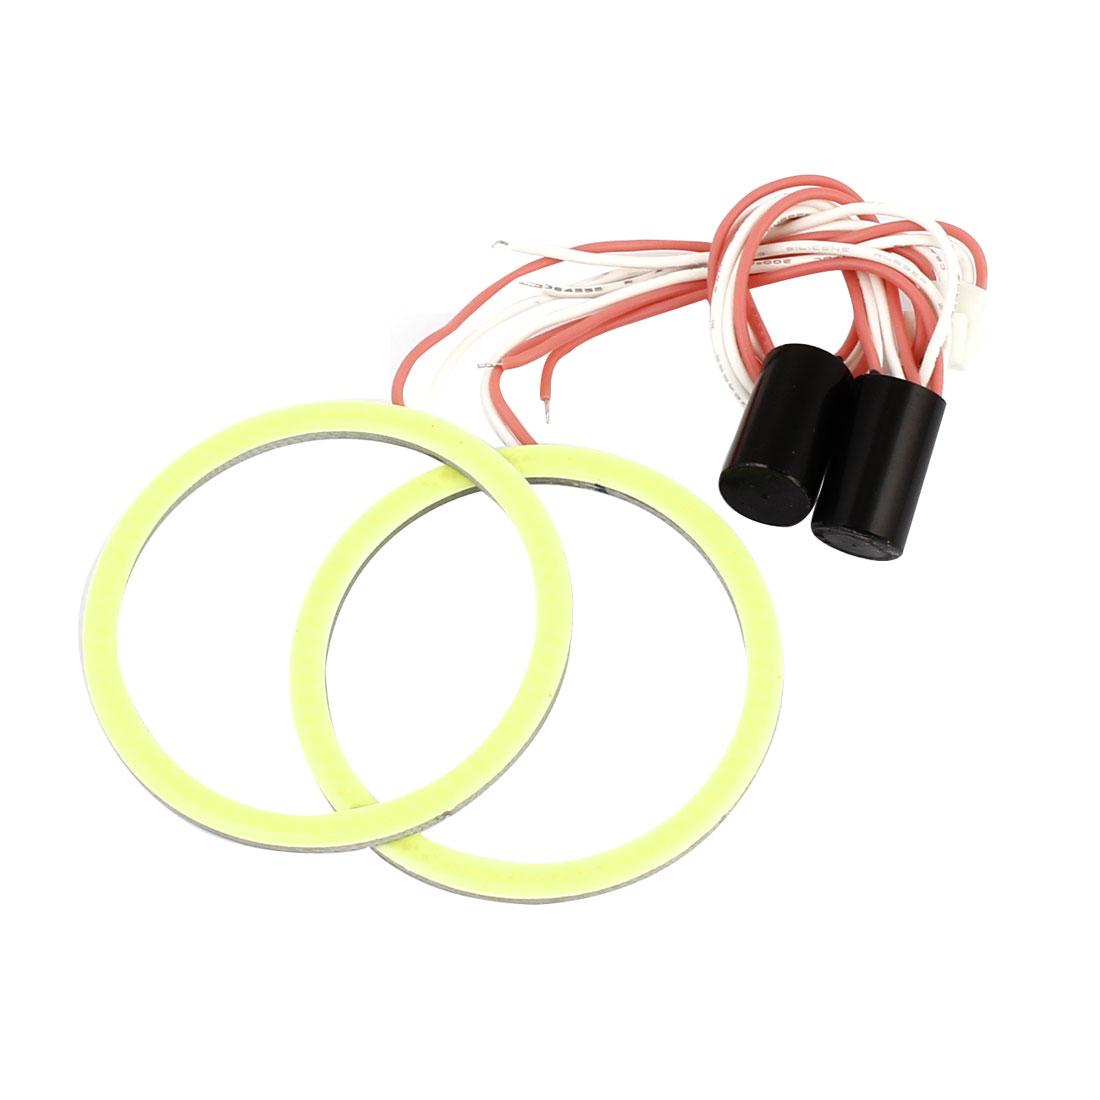 Pair 60mm Dia White COB Angel Eye Ring DRL Headlight Lamp Spare Blub 12V for Auto Car